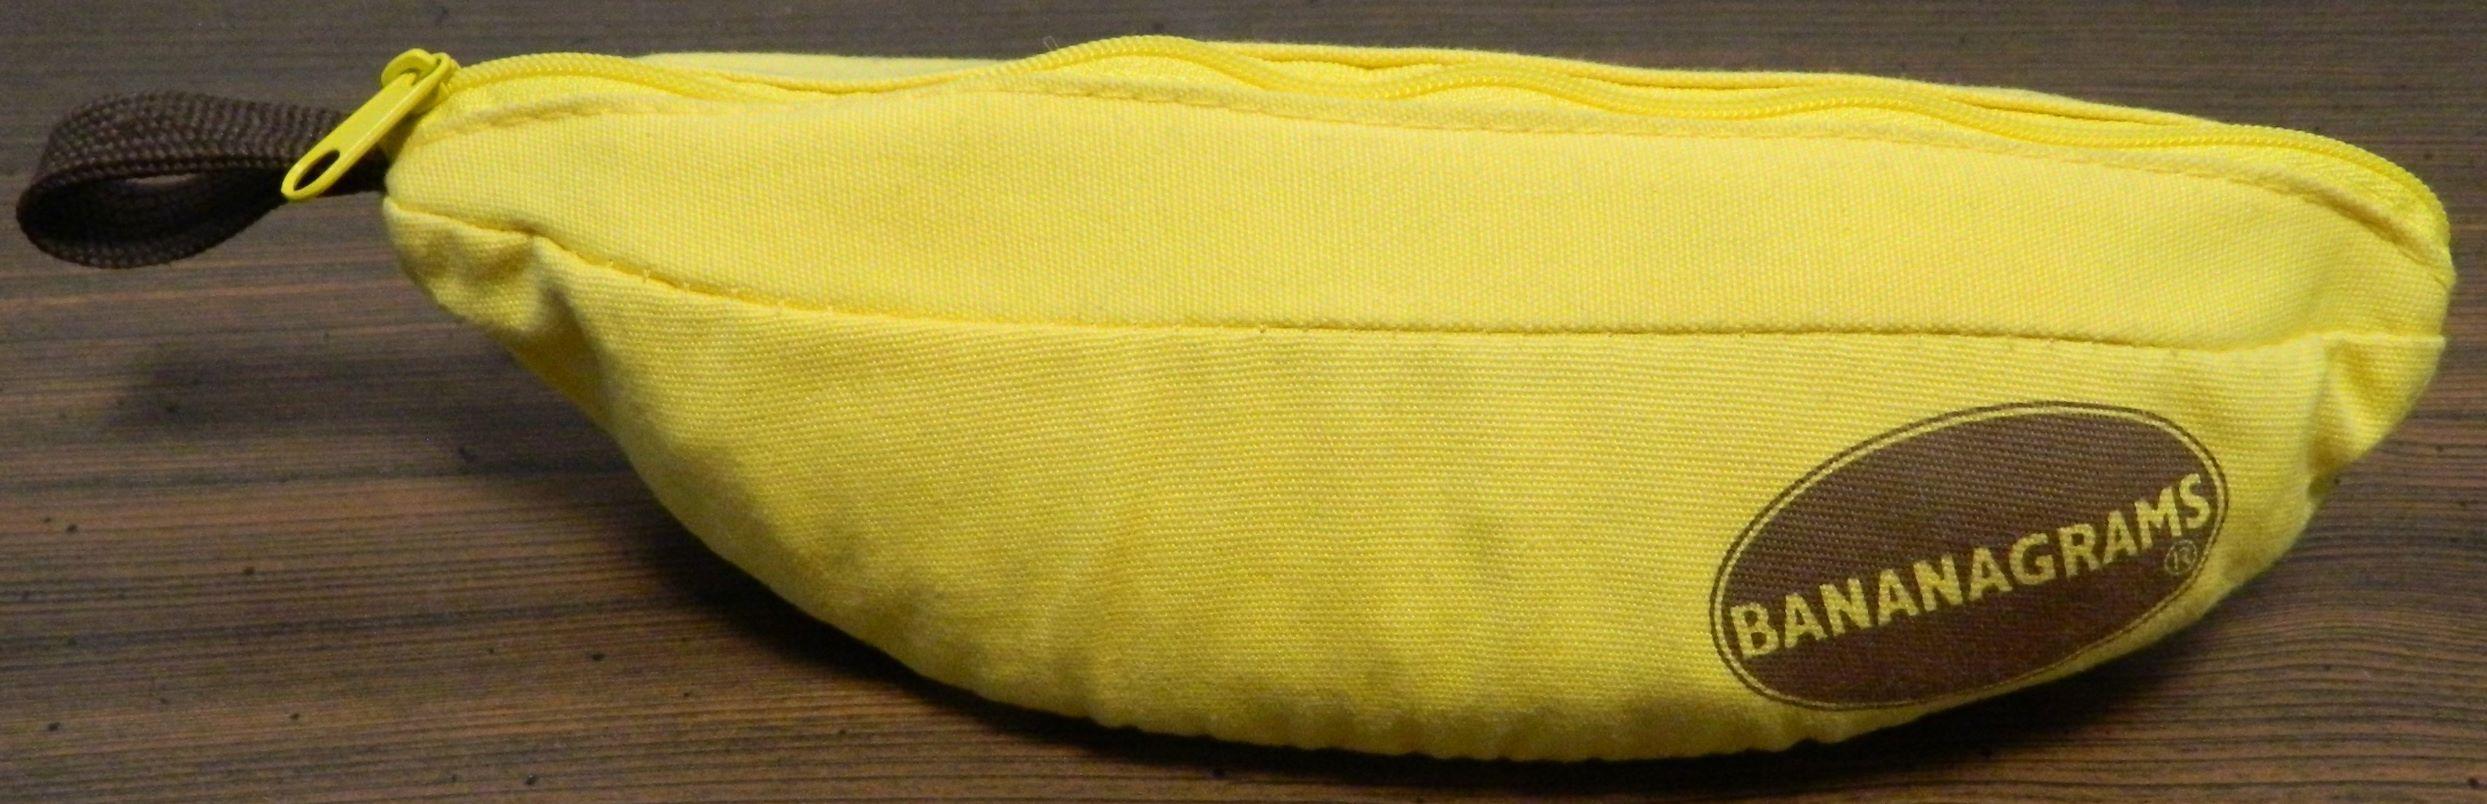 Packaging for Bananagrams